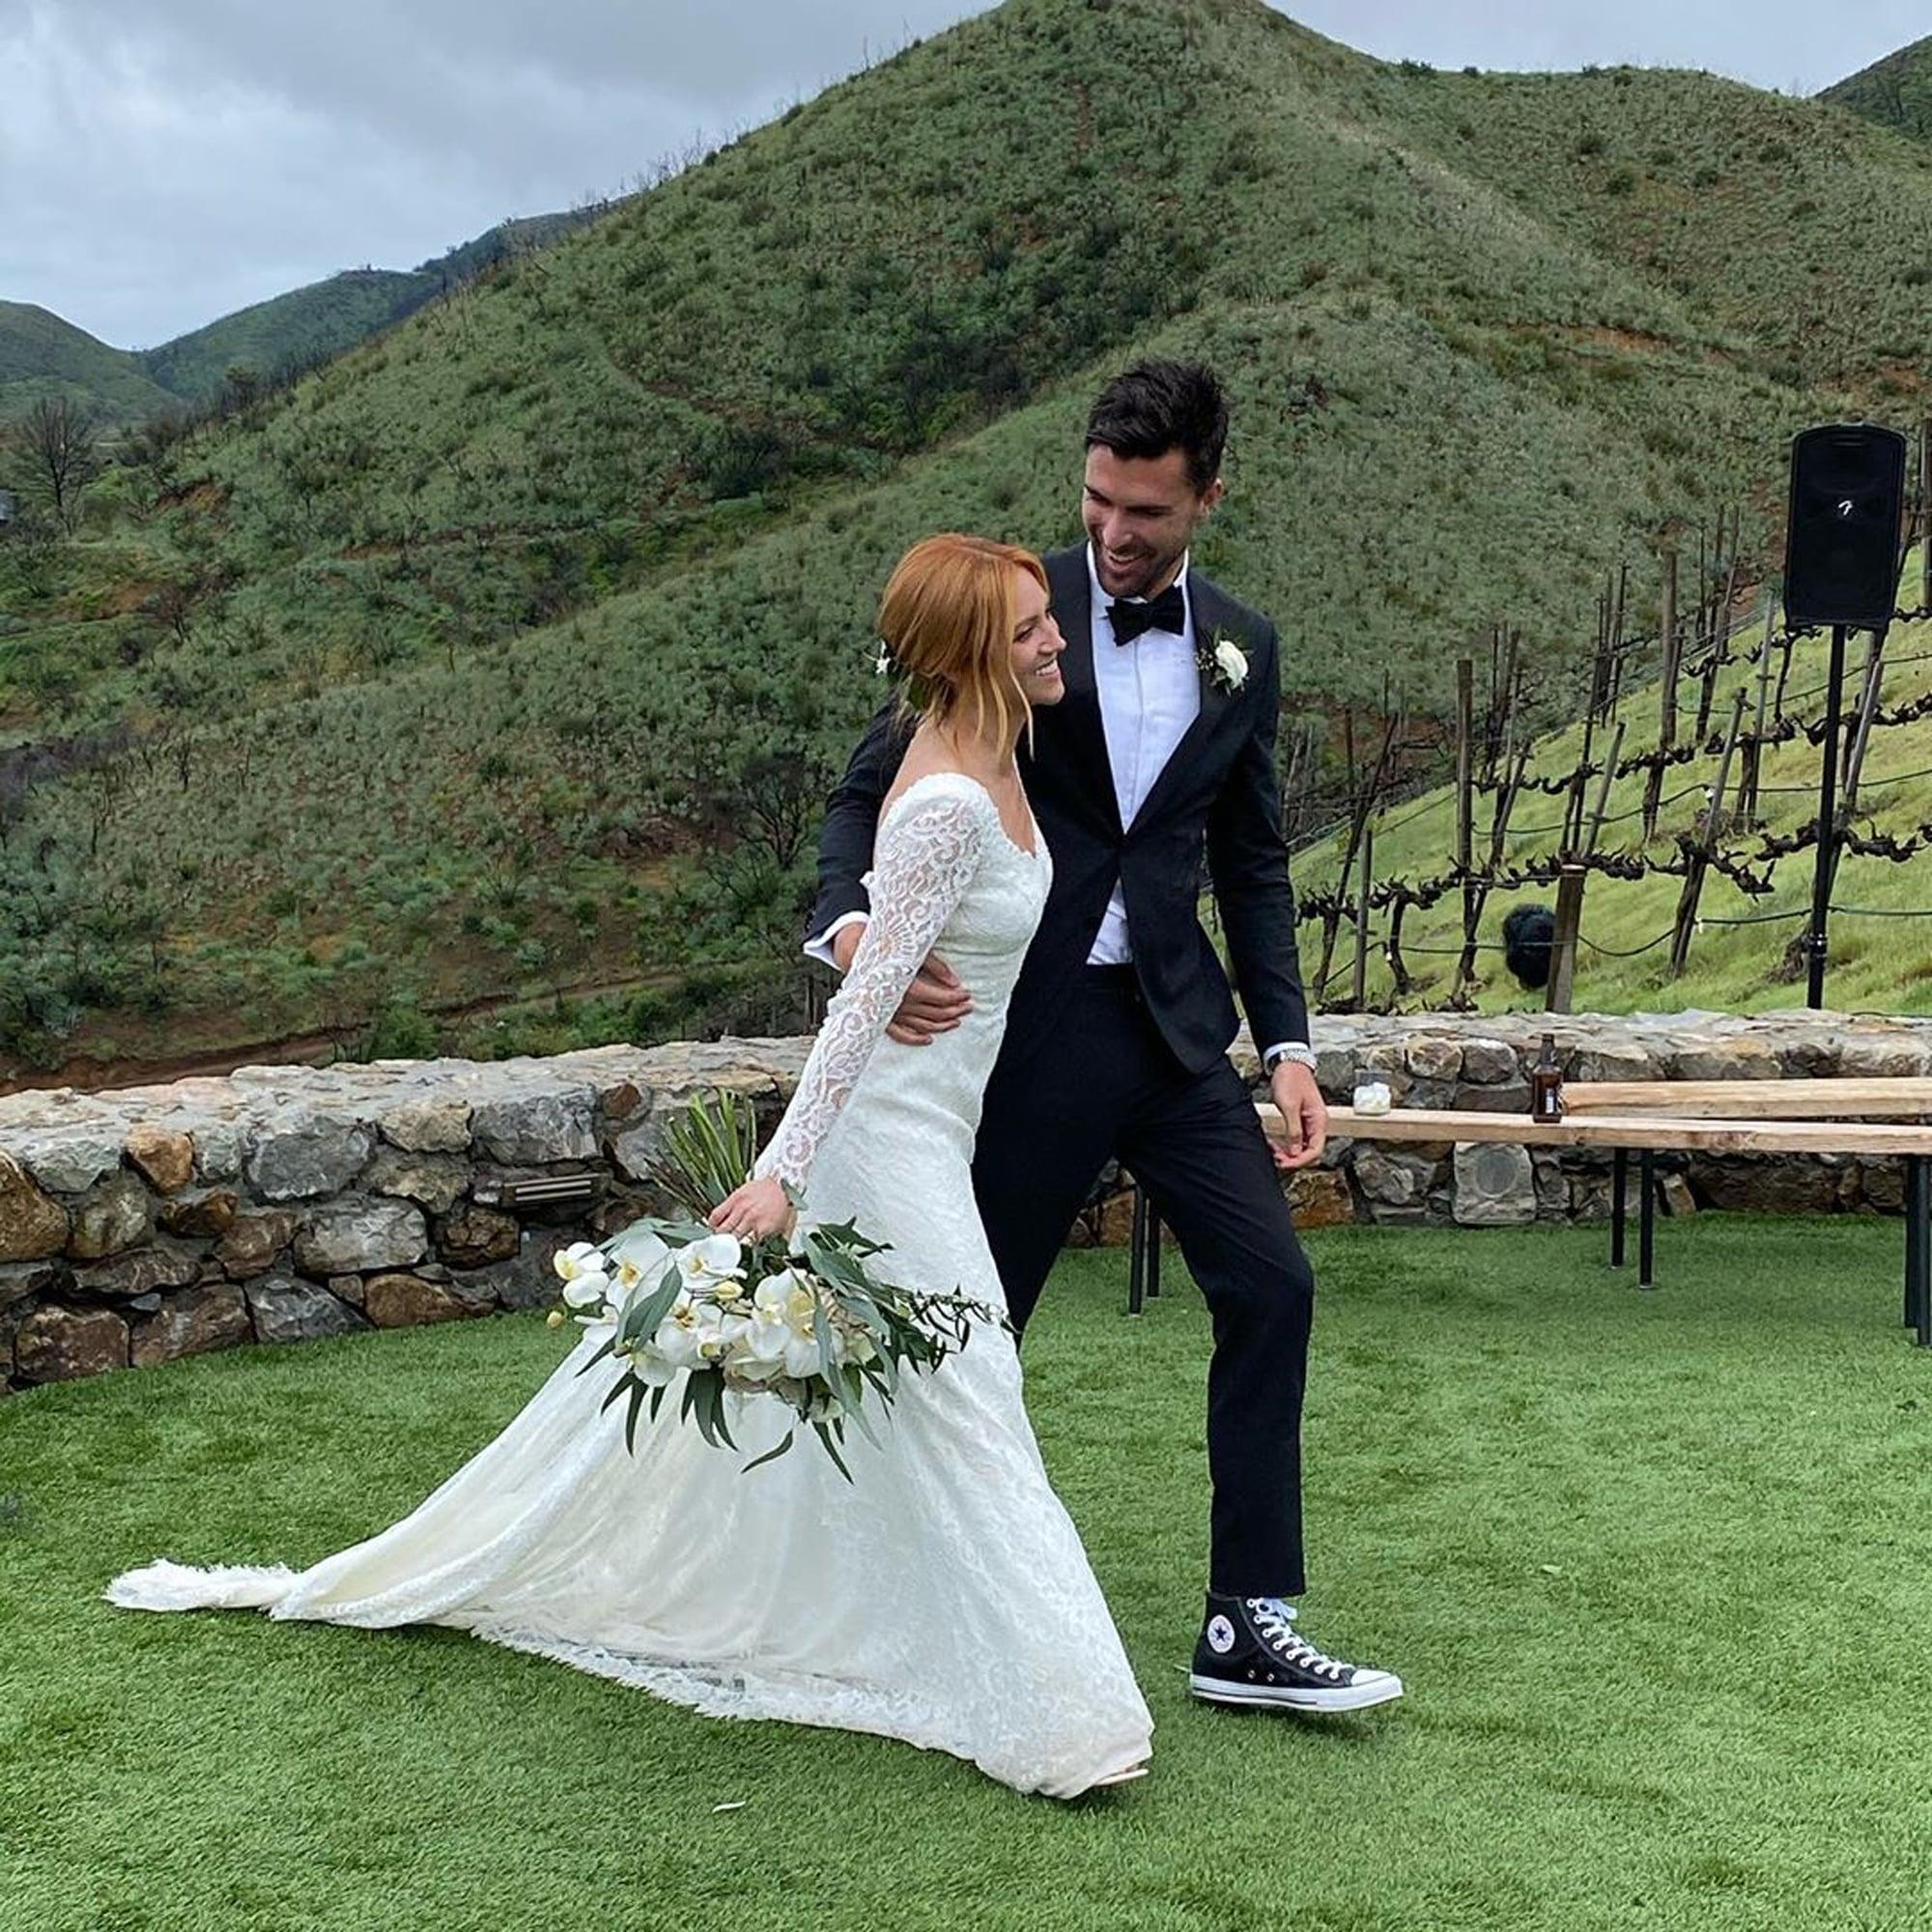 Brittany Snow Wore a Jonathan Simkhai Wedding Dress   POPSUGAR Fashion